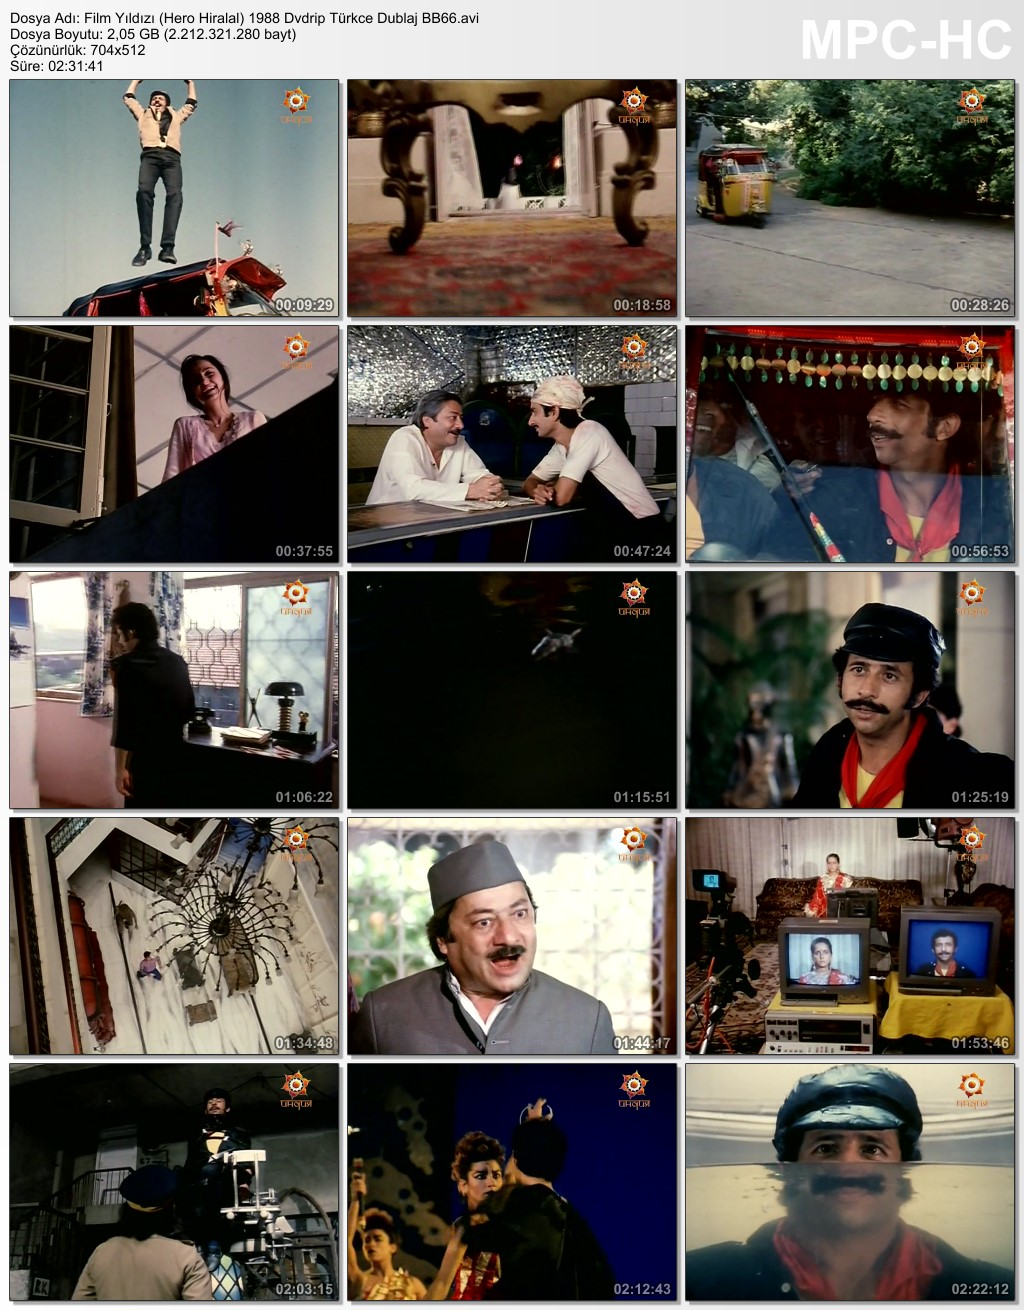 Film Yıldızı (Hero Hiralal) 1988 Dvdrip Türkce Dublaj BB66 (7) - barbarus